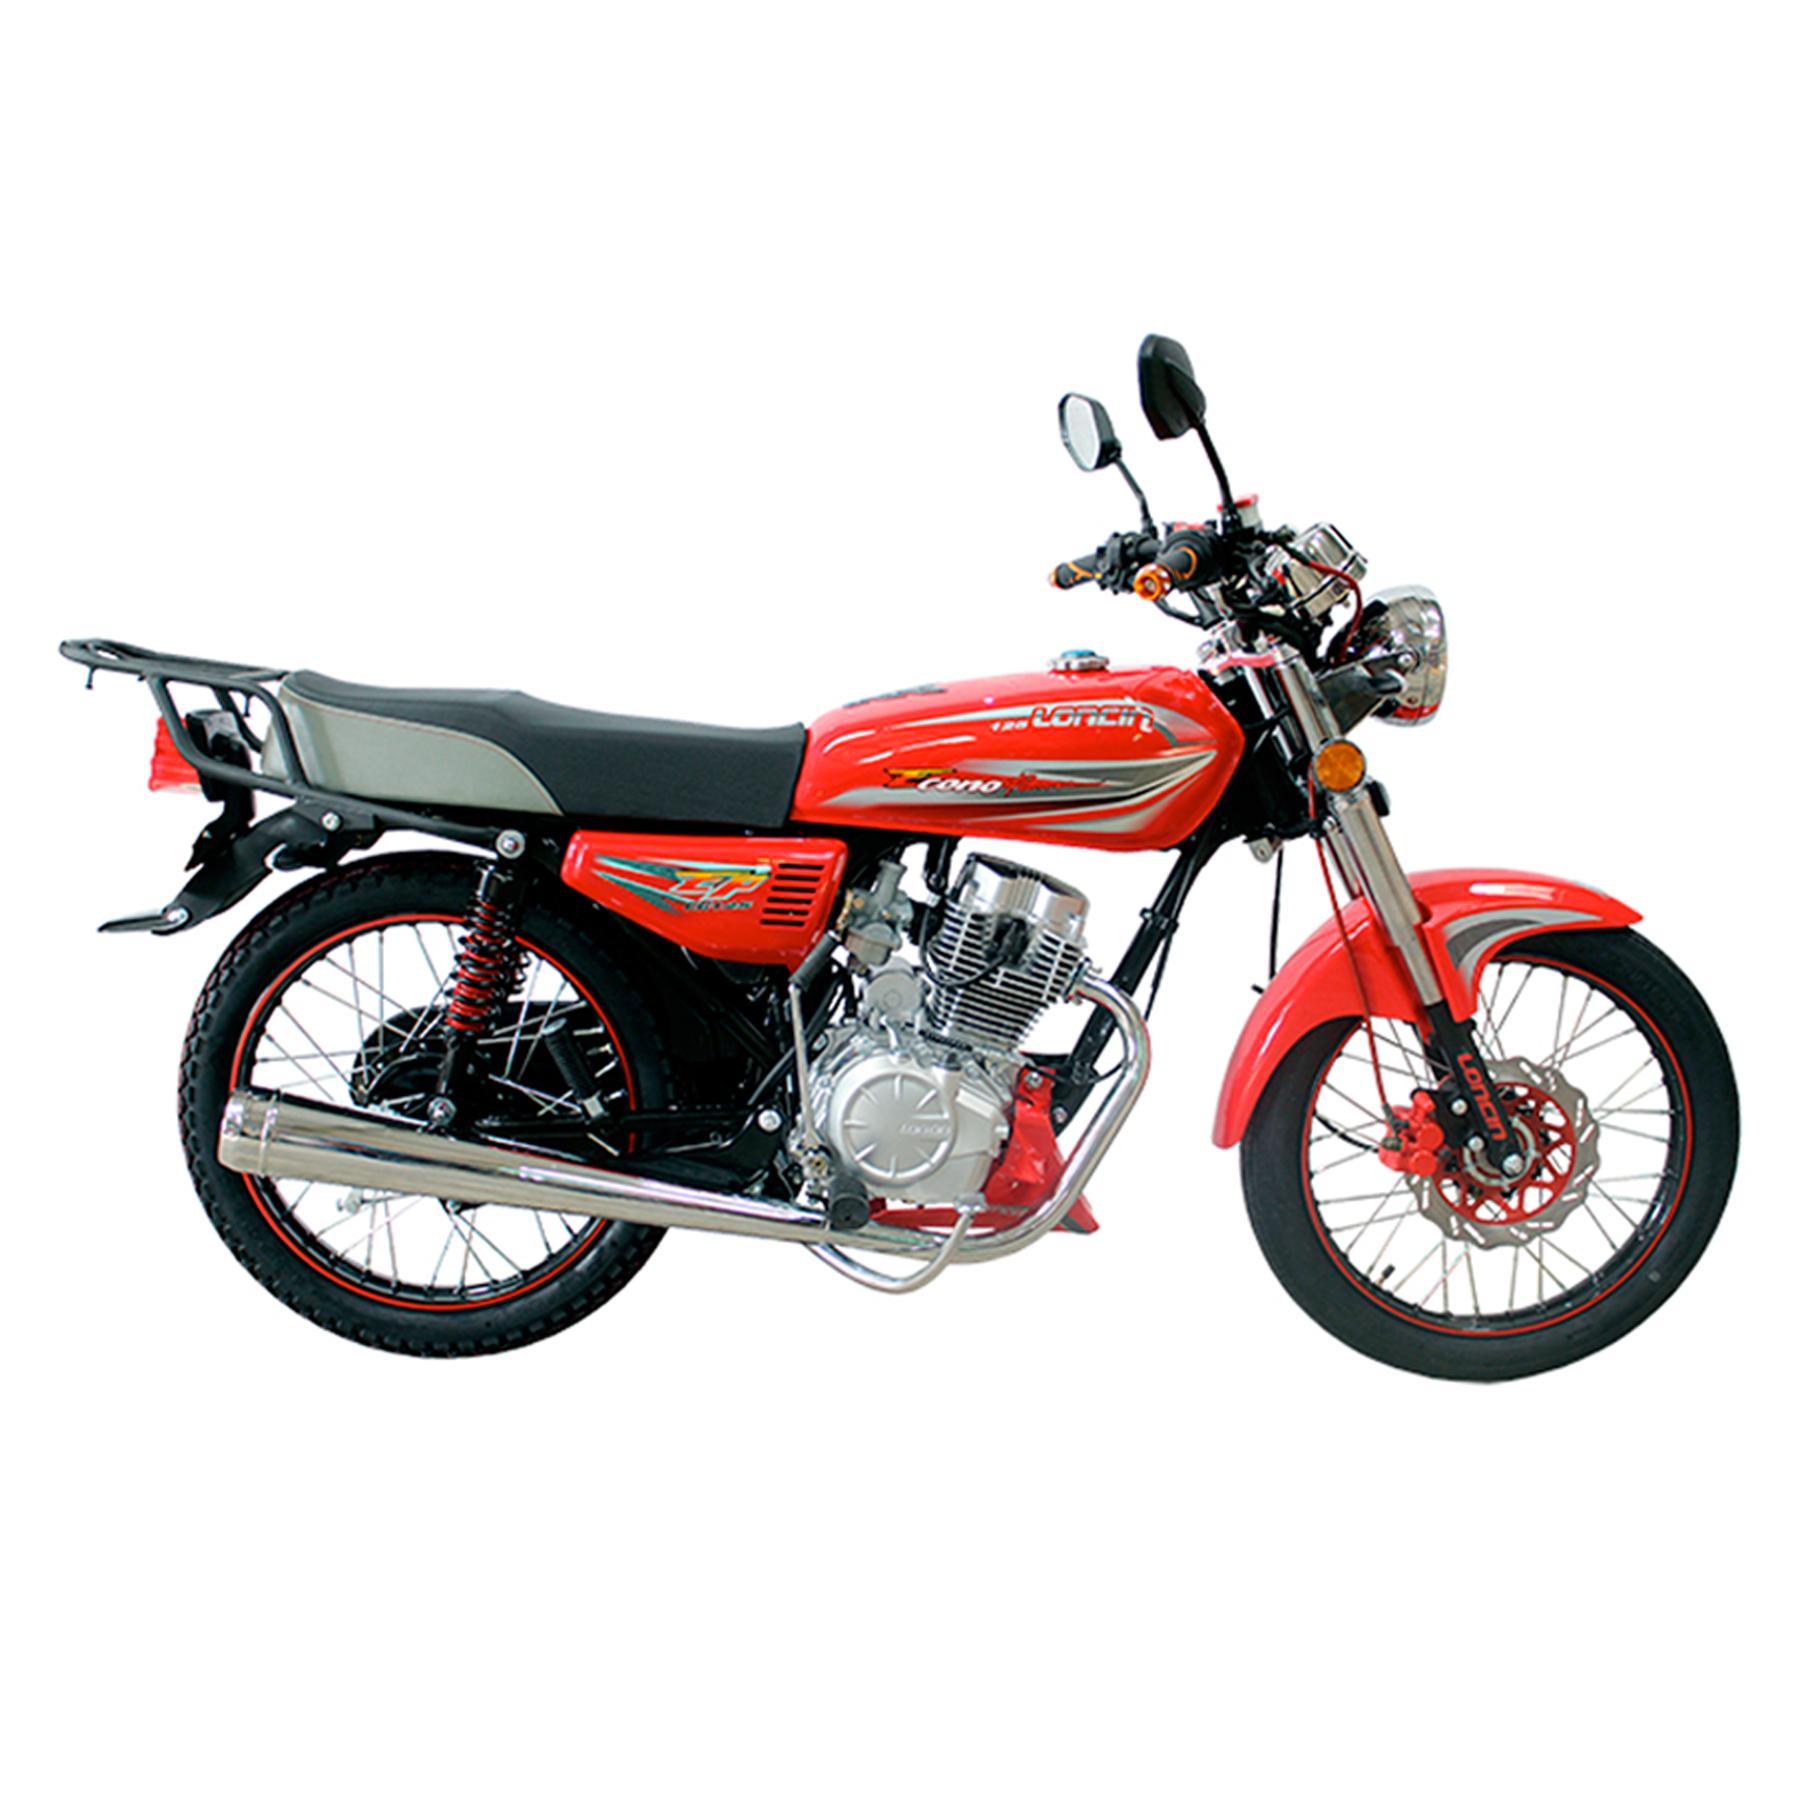 Motorcycle Loncin CG 125